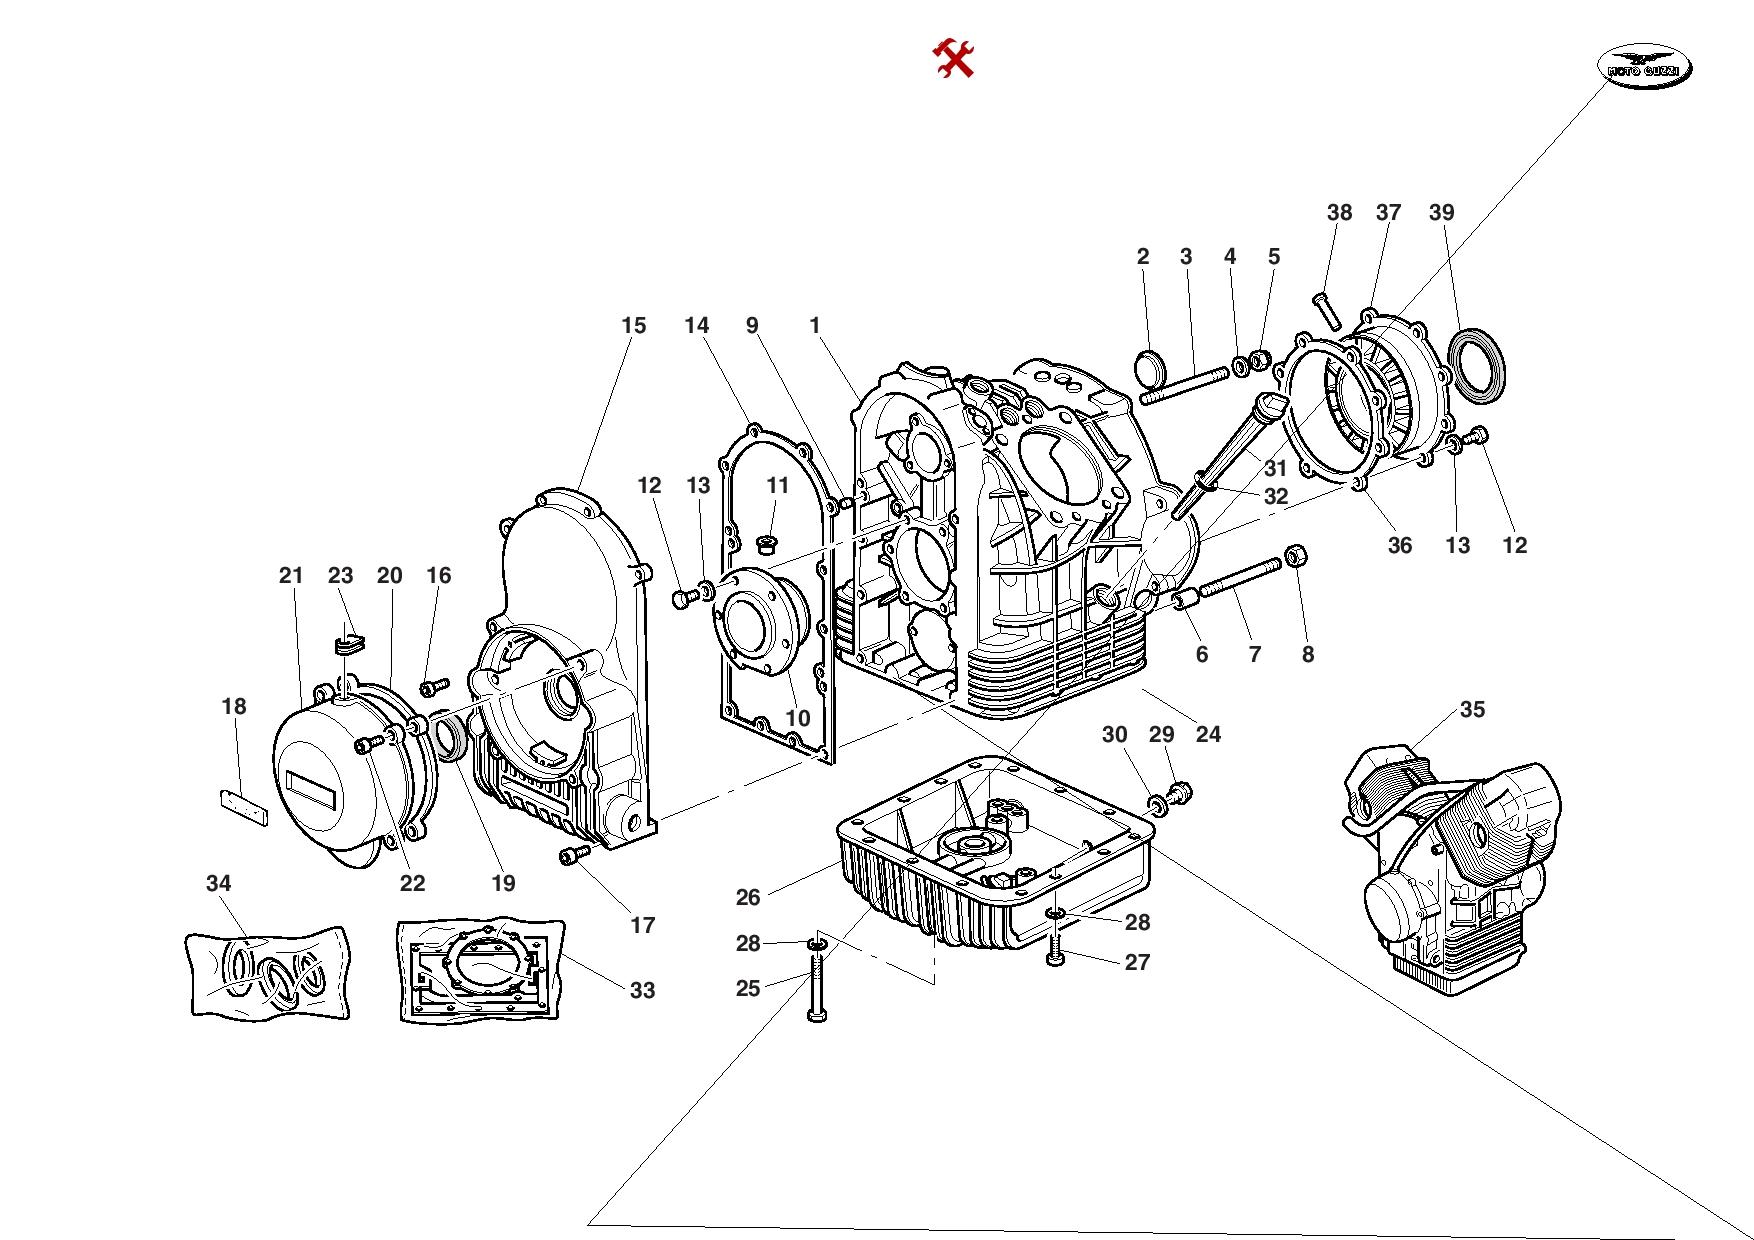 Moto Guzzi California Special Sport 2001 Parts List PDF